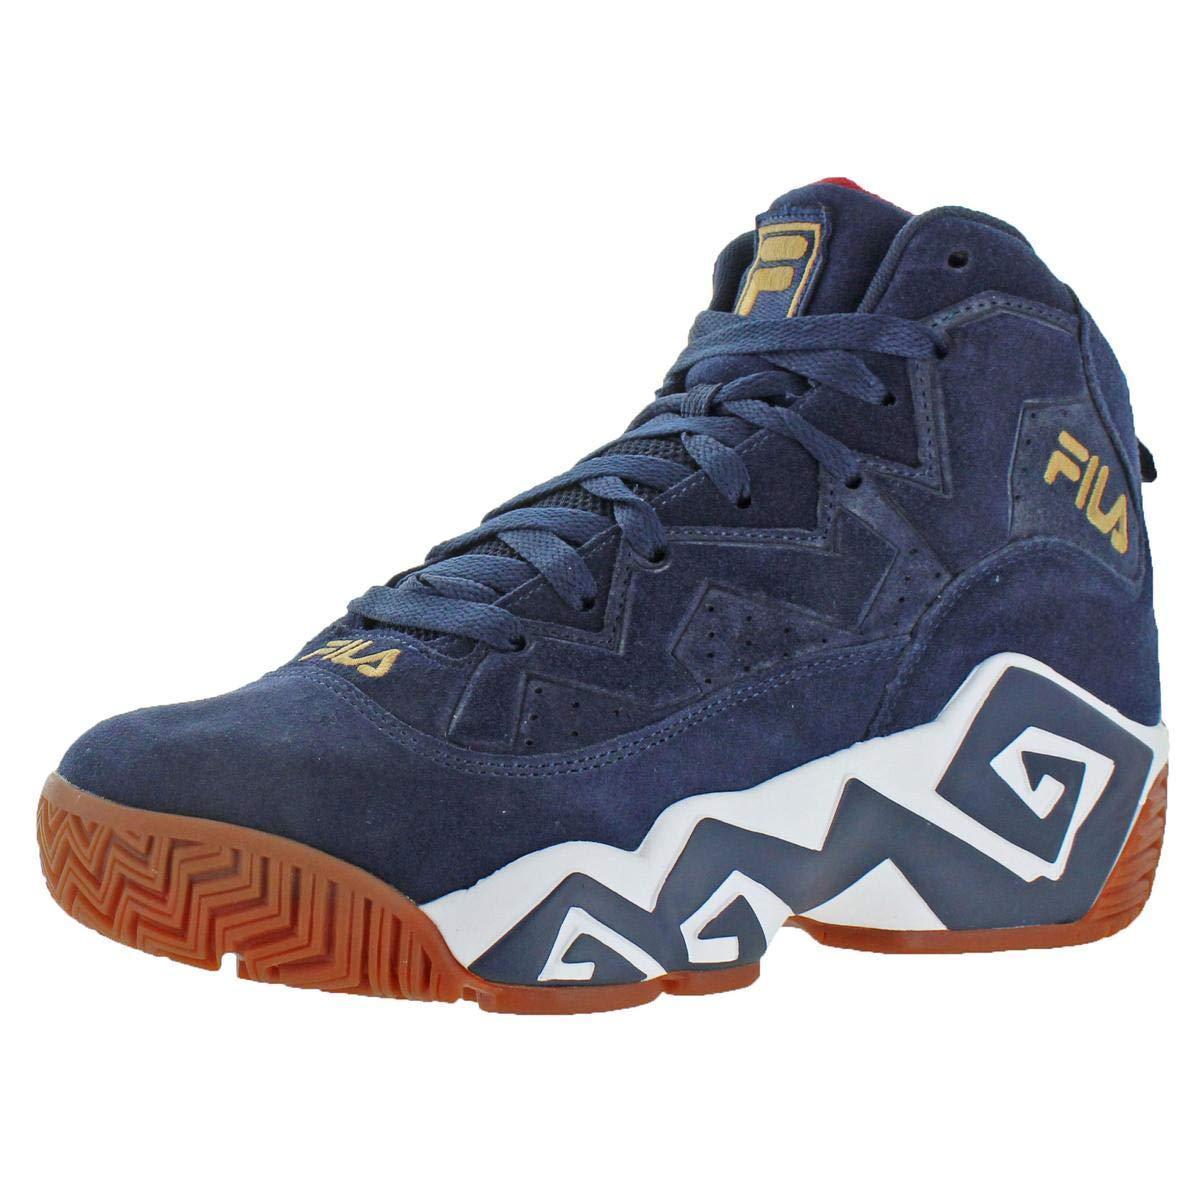 Buy Fila Men's Mb Fashion Sneaker, Navy